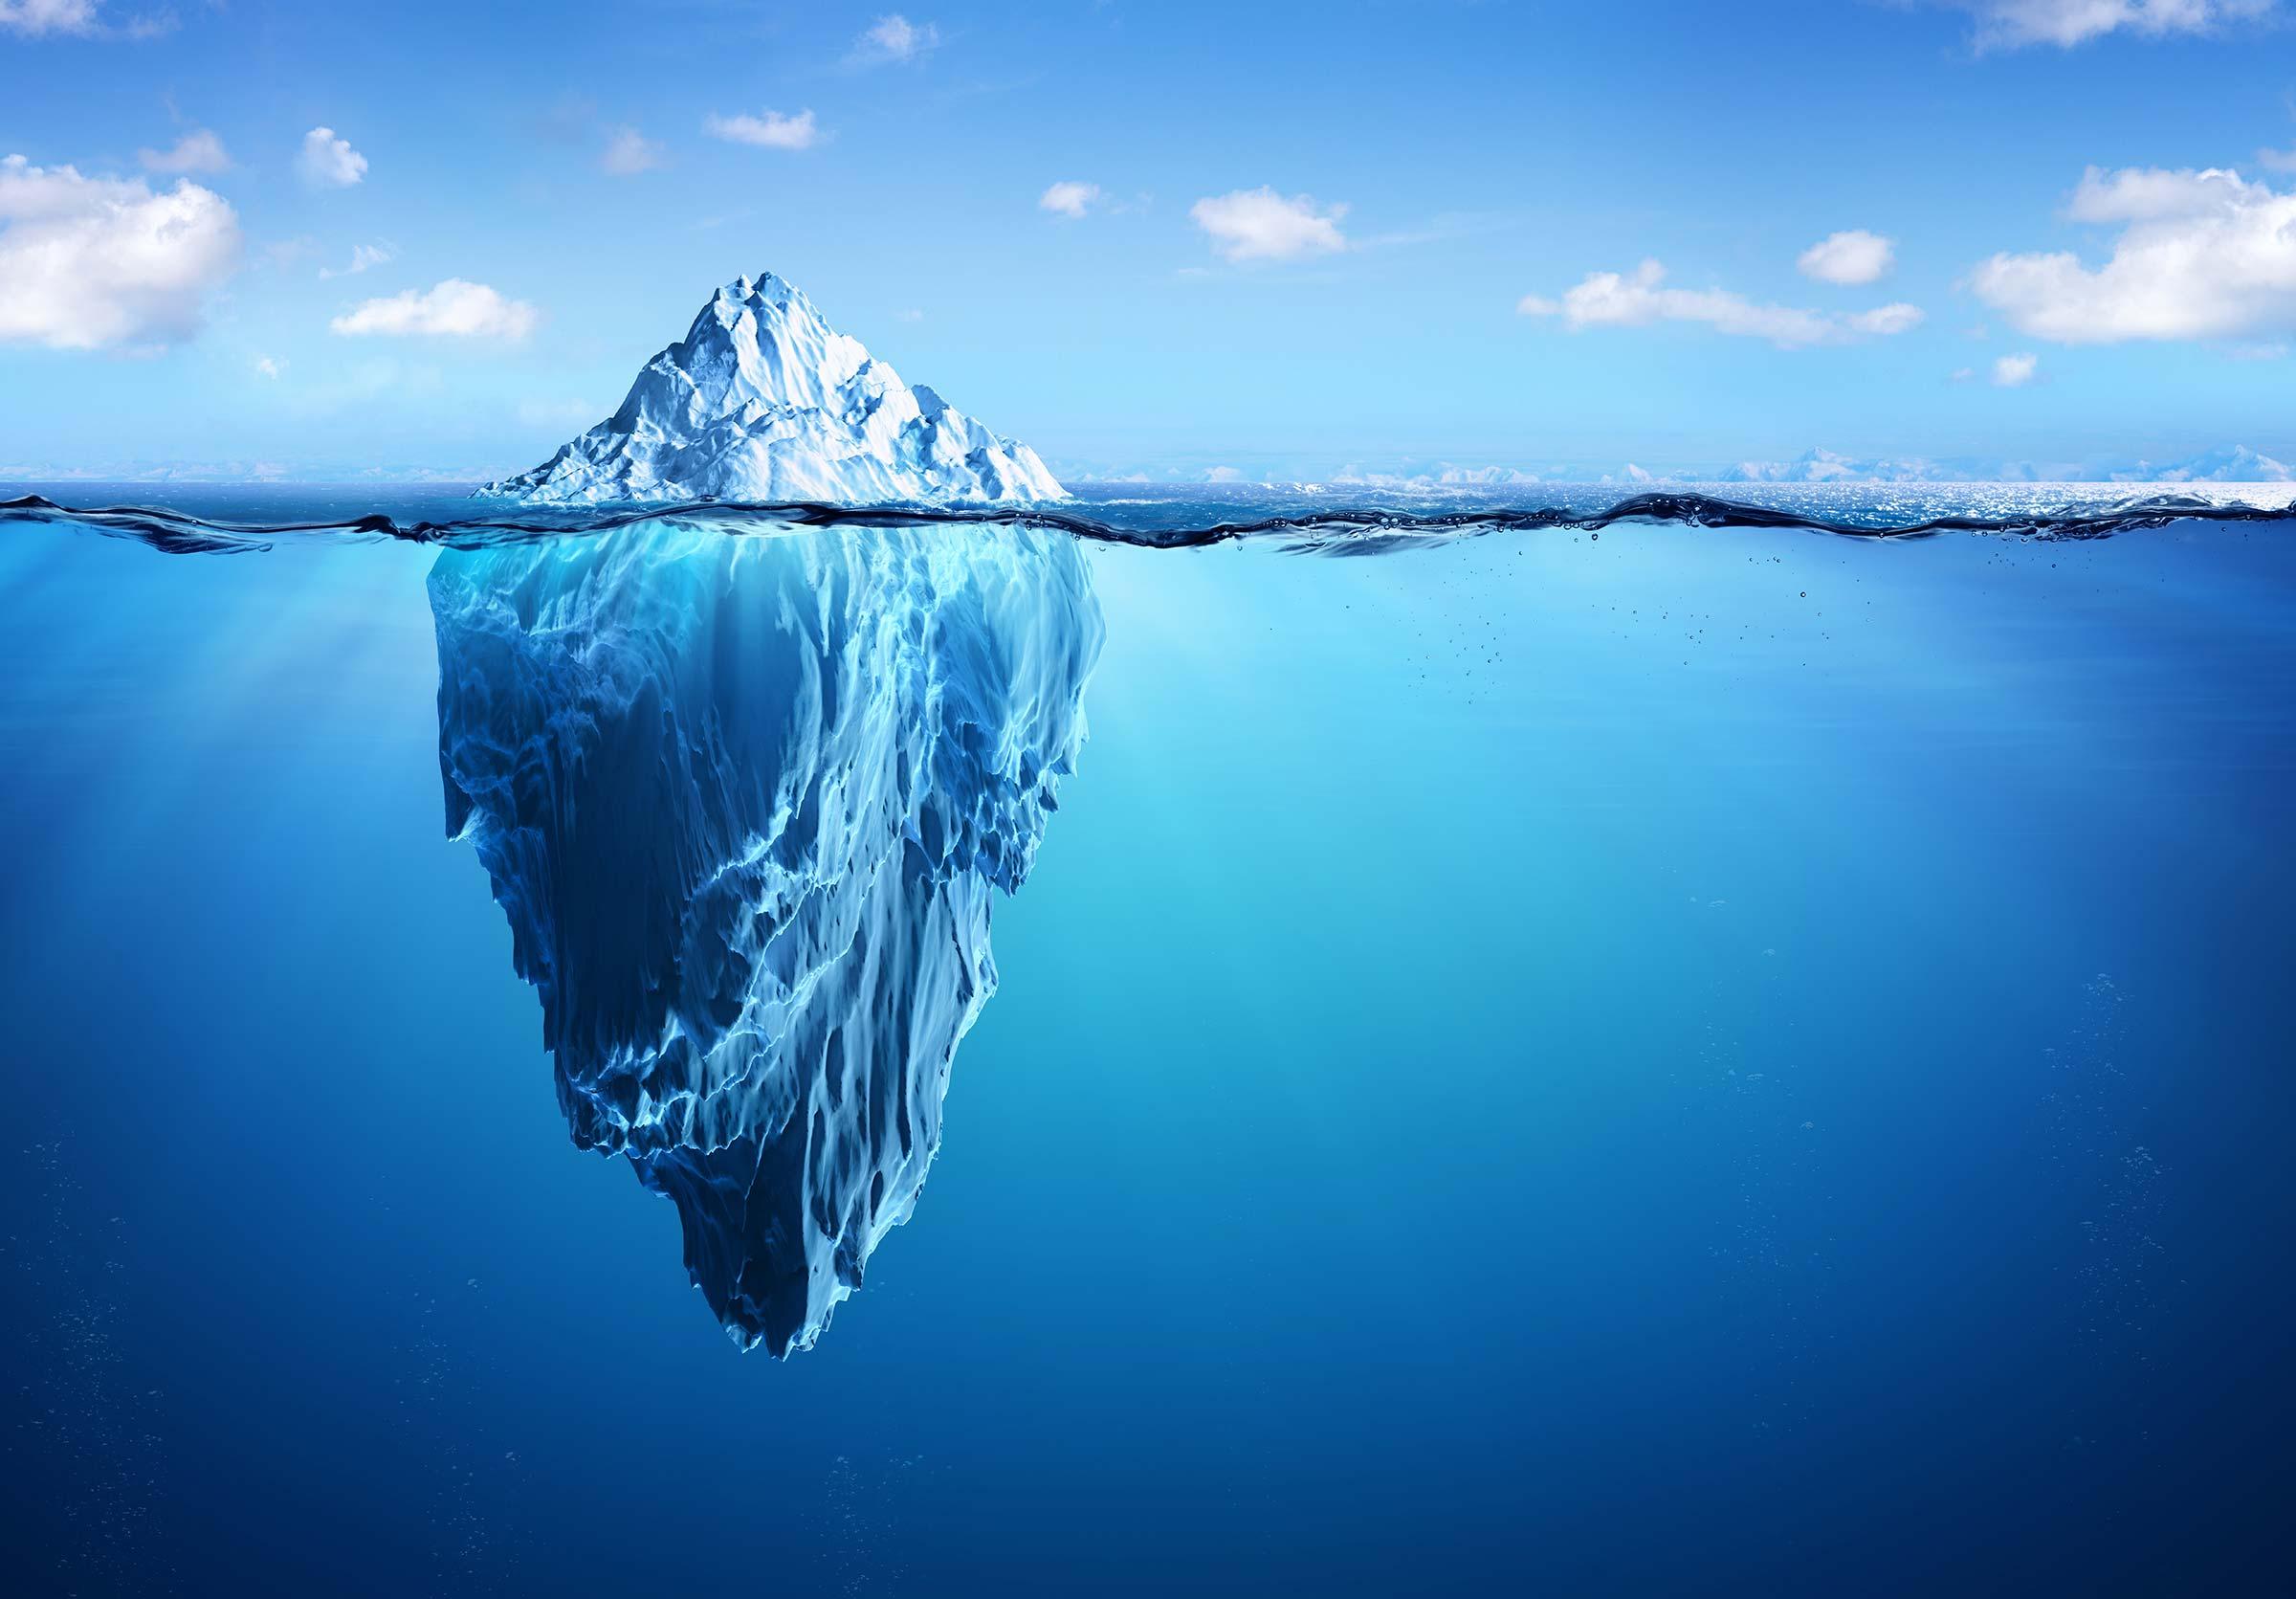 Oops! The burping iceberg!